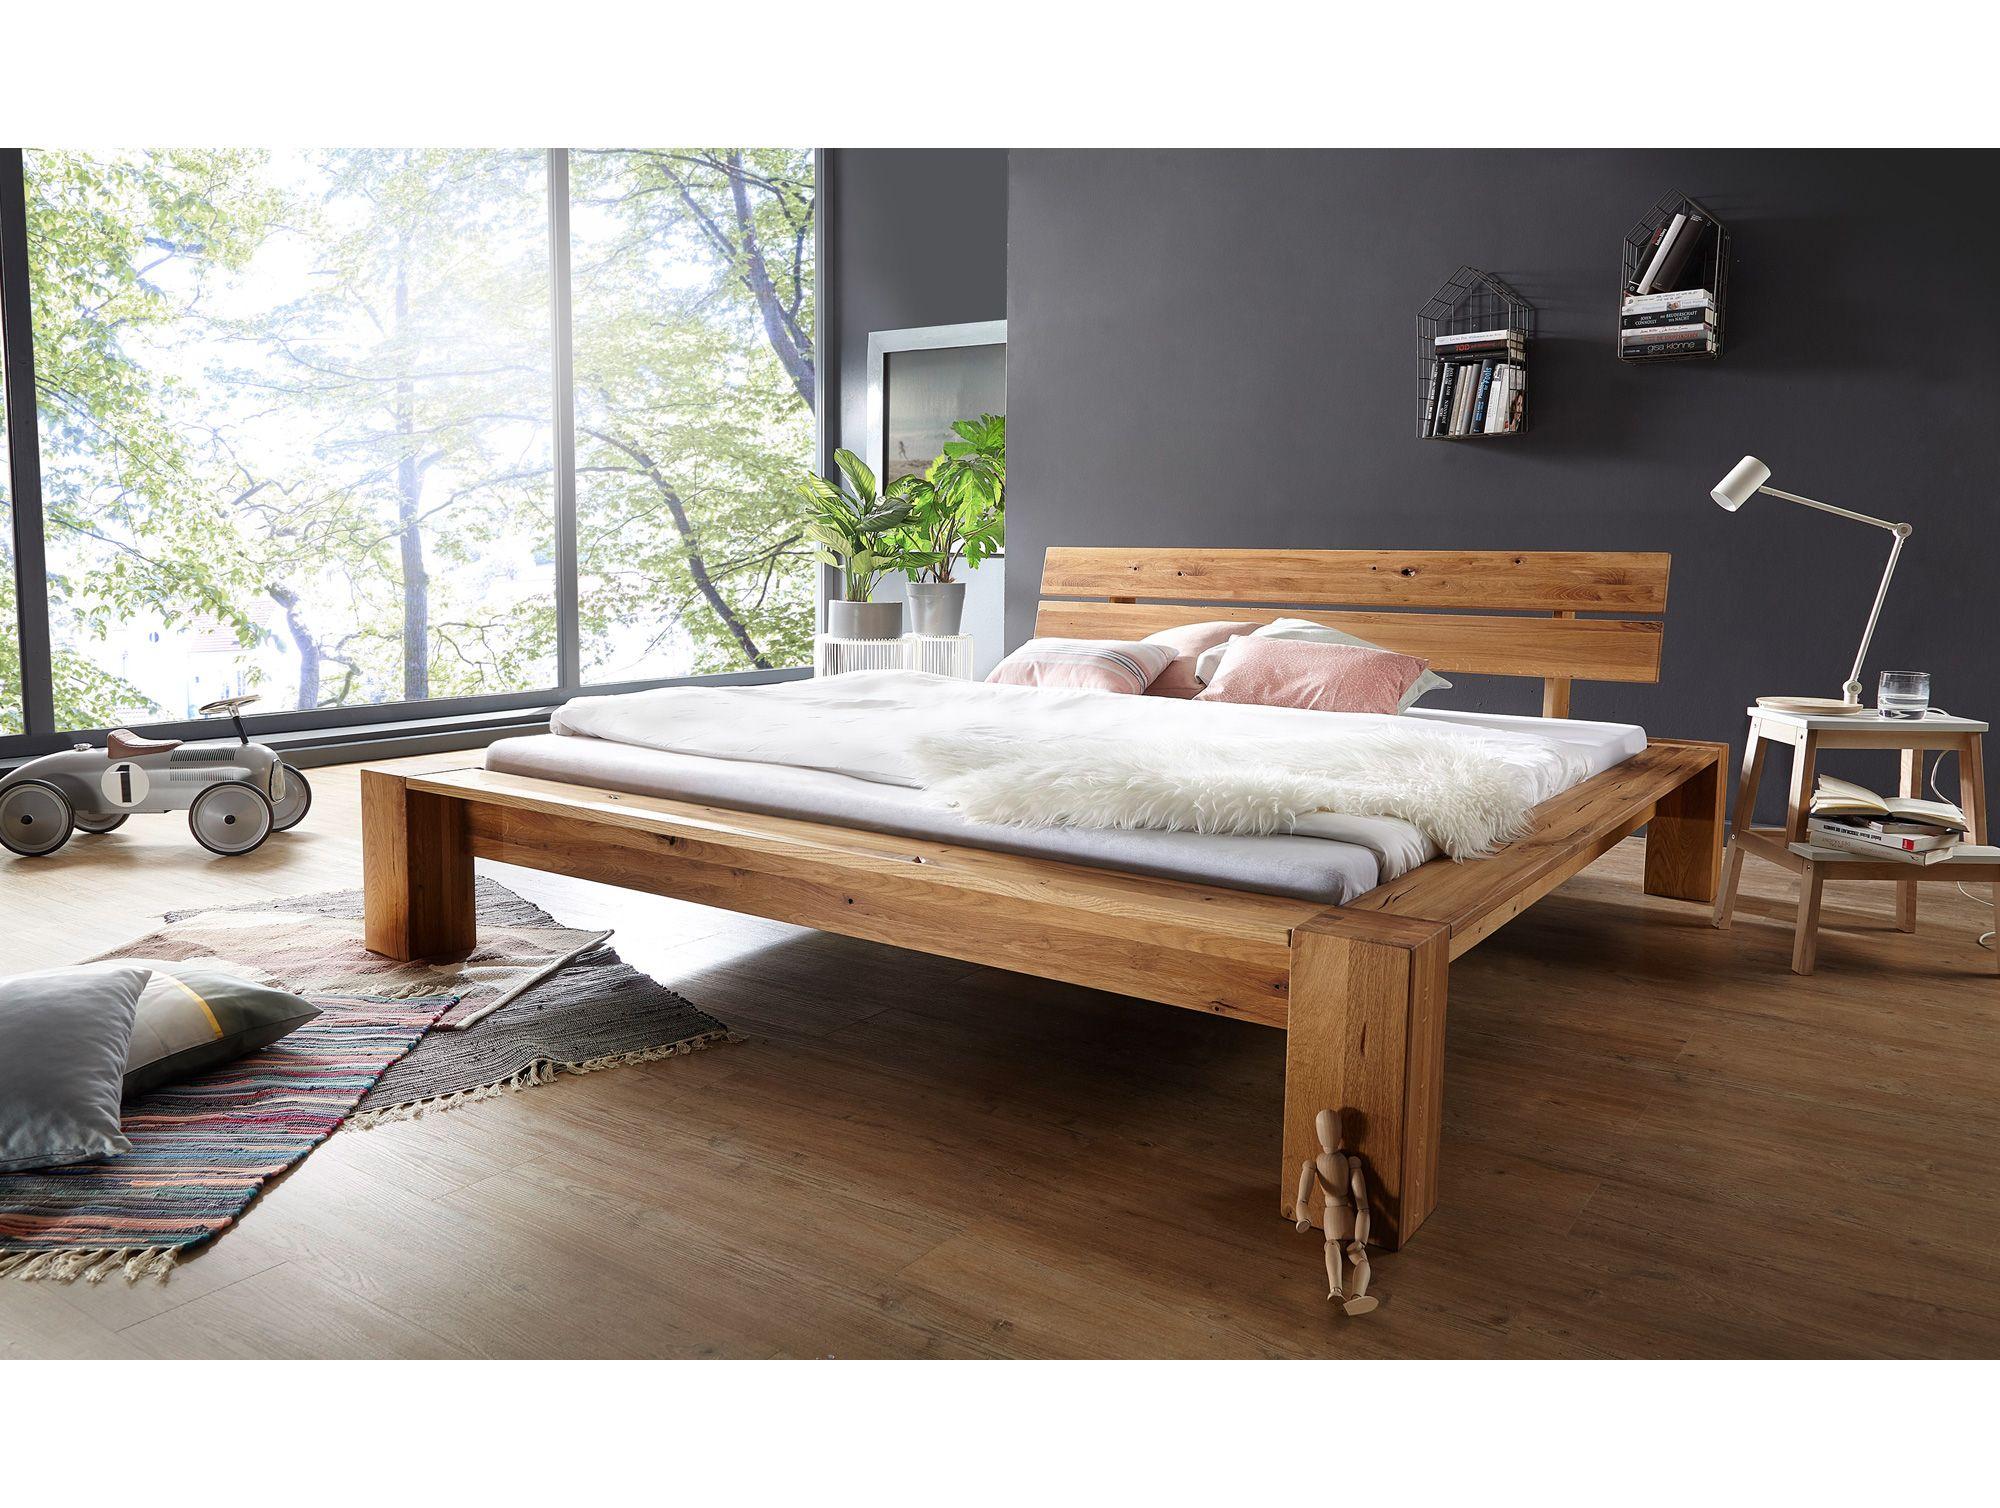 DAVINA Doppelbett Wildeiche geölt massiv Bett